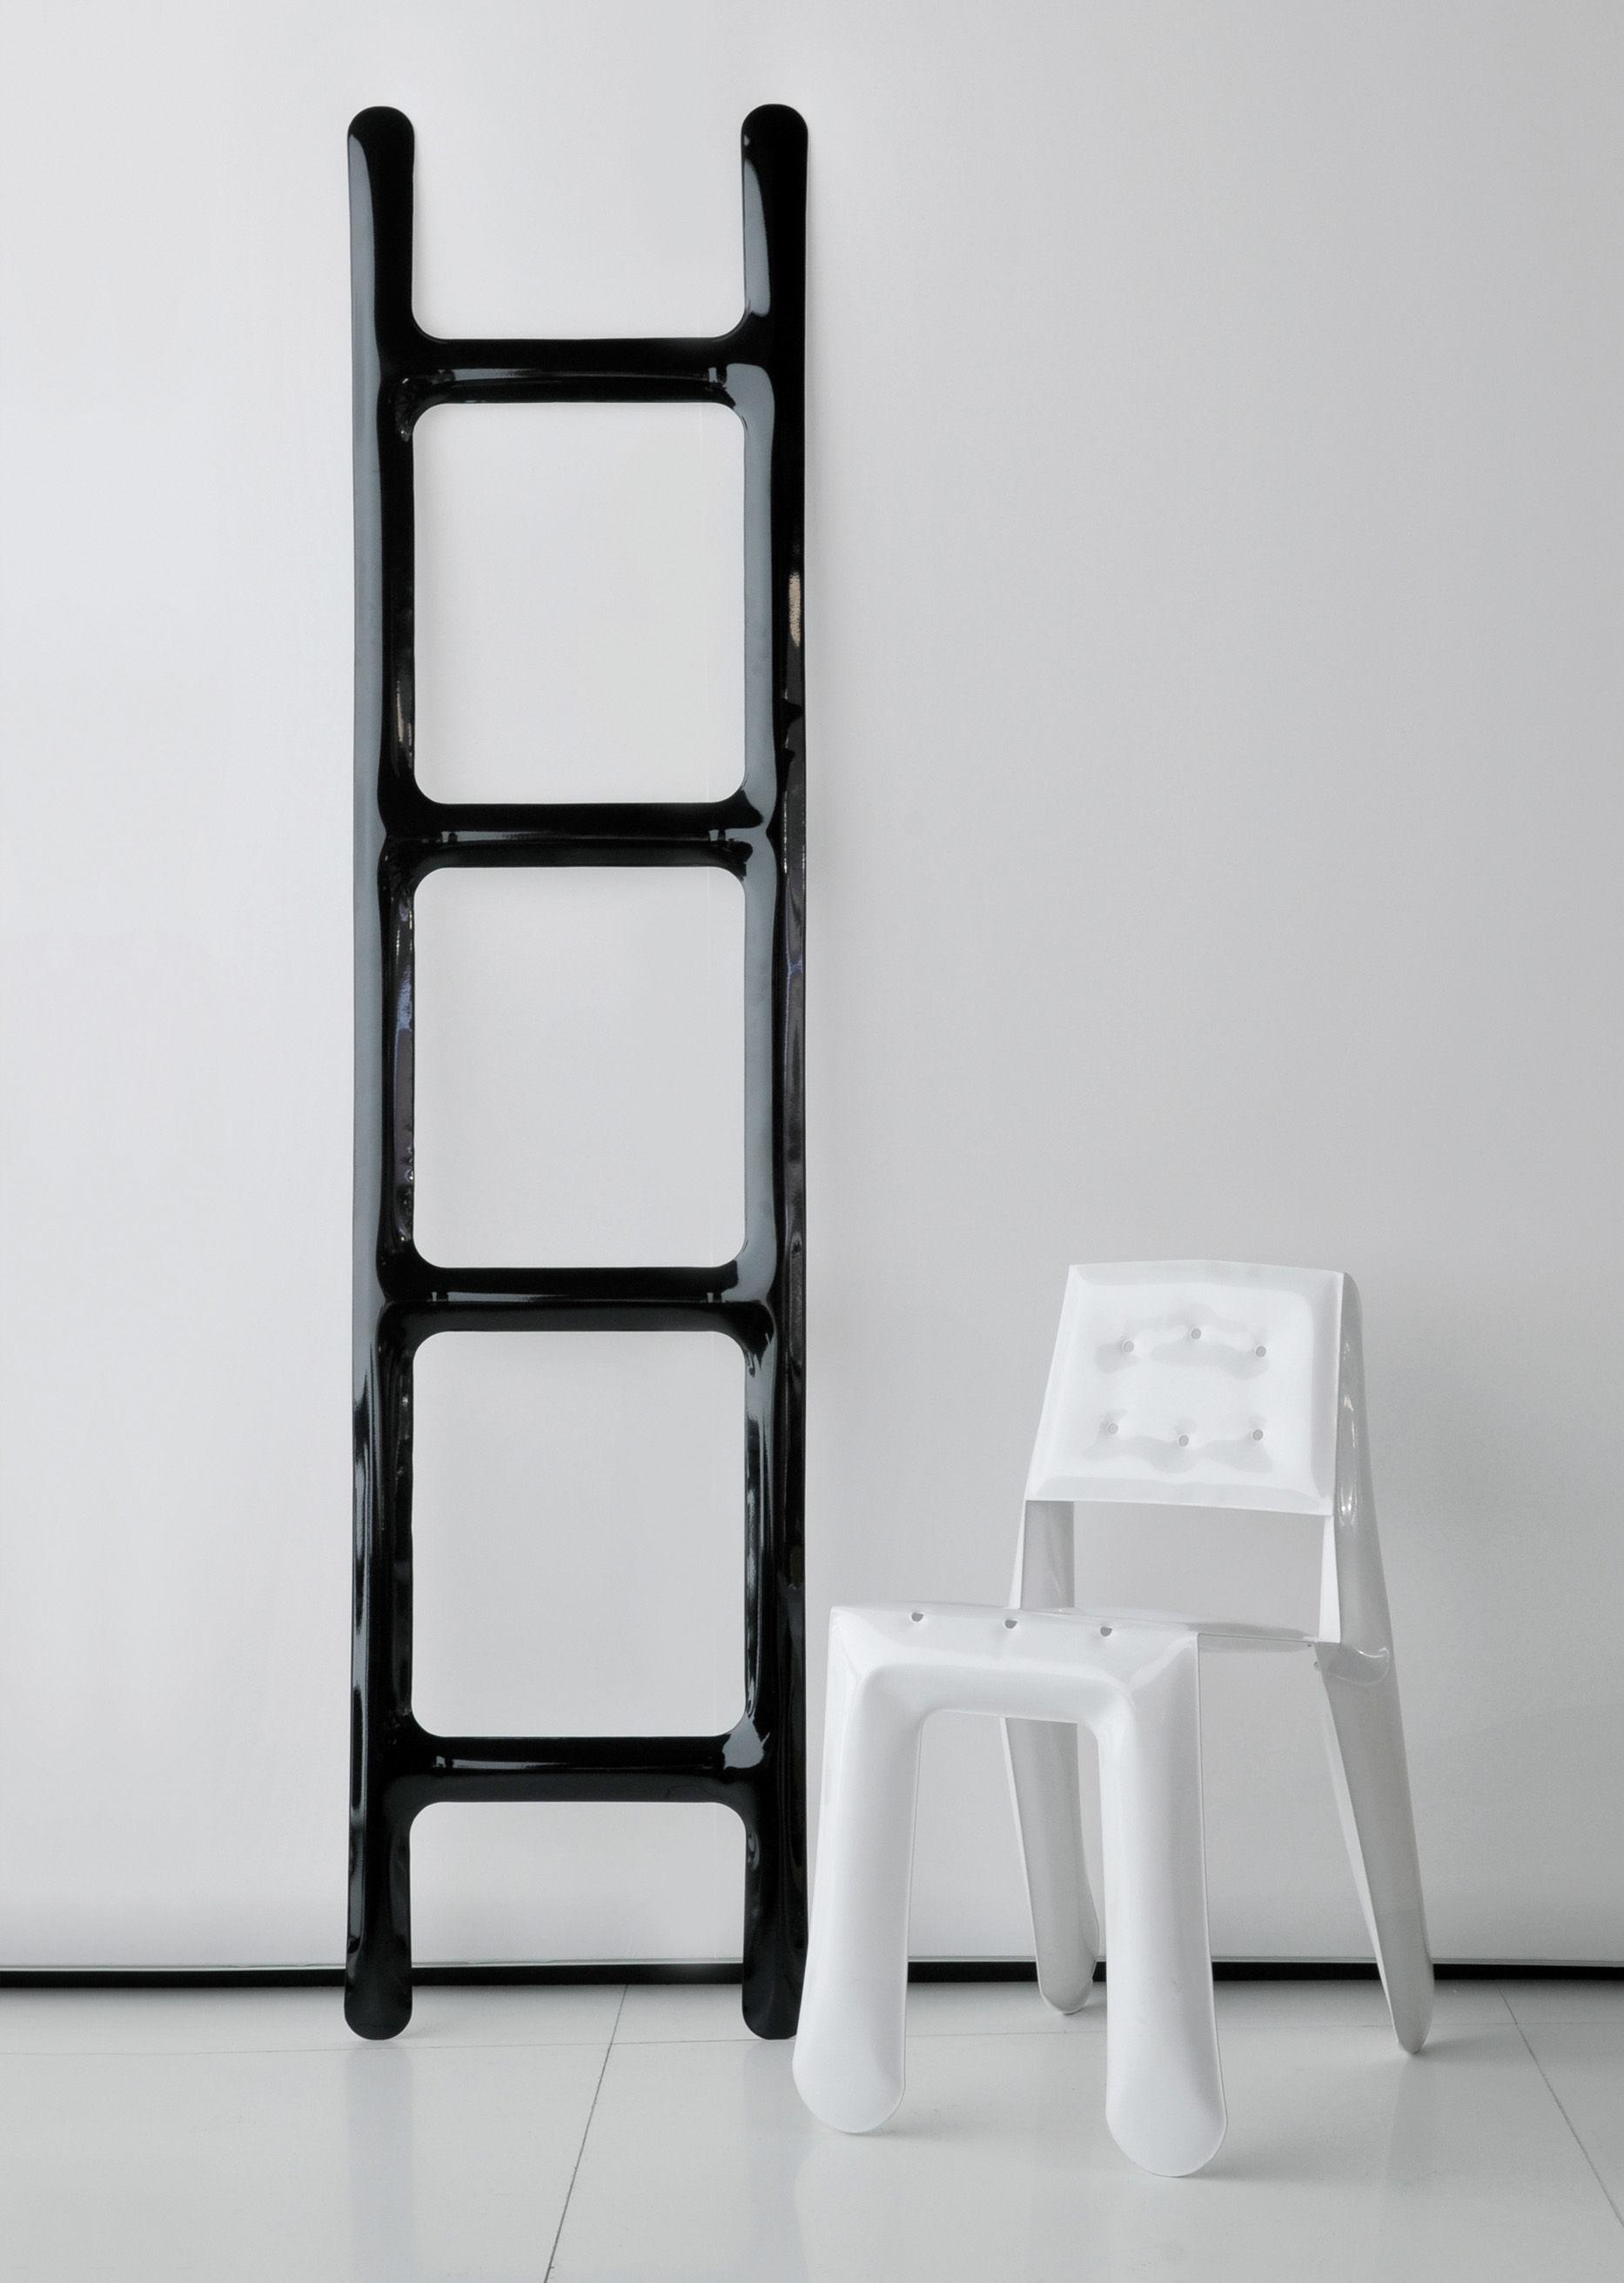 Drab porta asciugamani h 188 cm acciaio brillante by zieta made in design - Porta asciugamani design ...